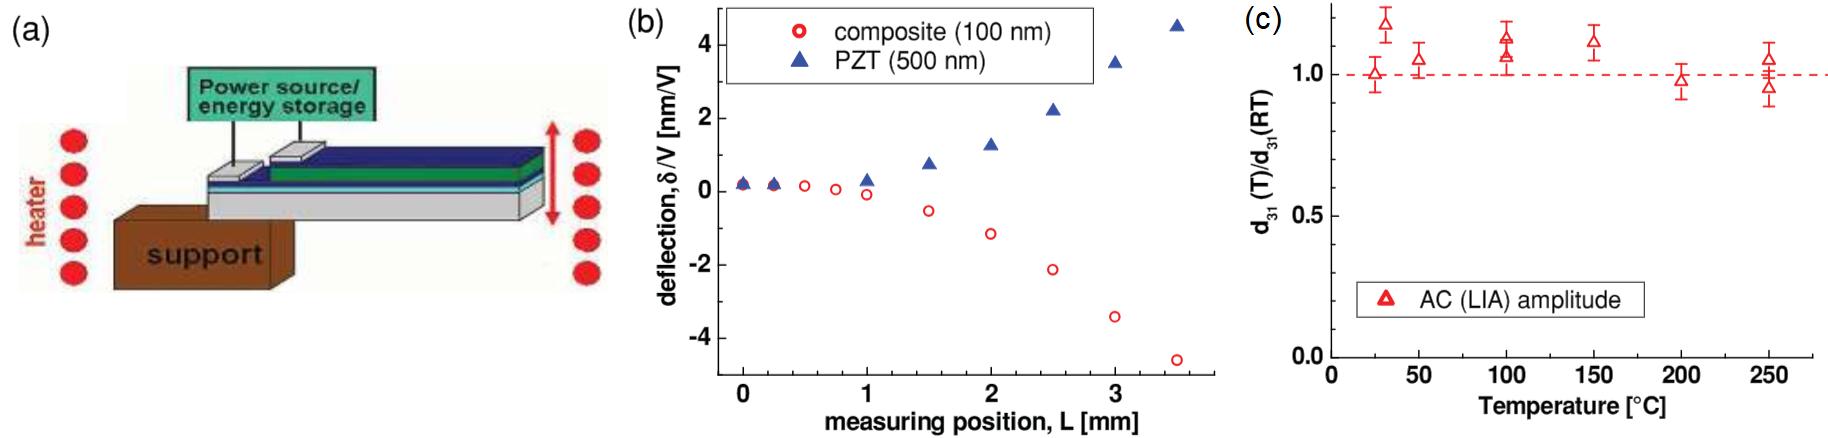 Nanocomposite microactuator